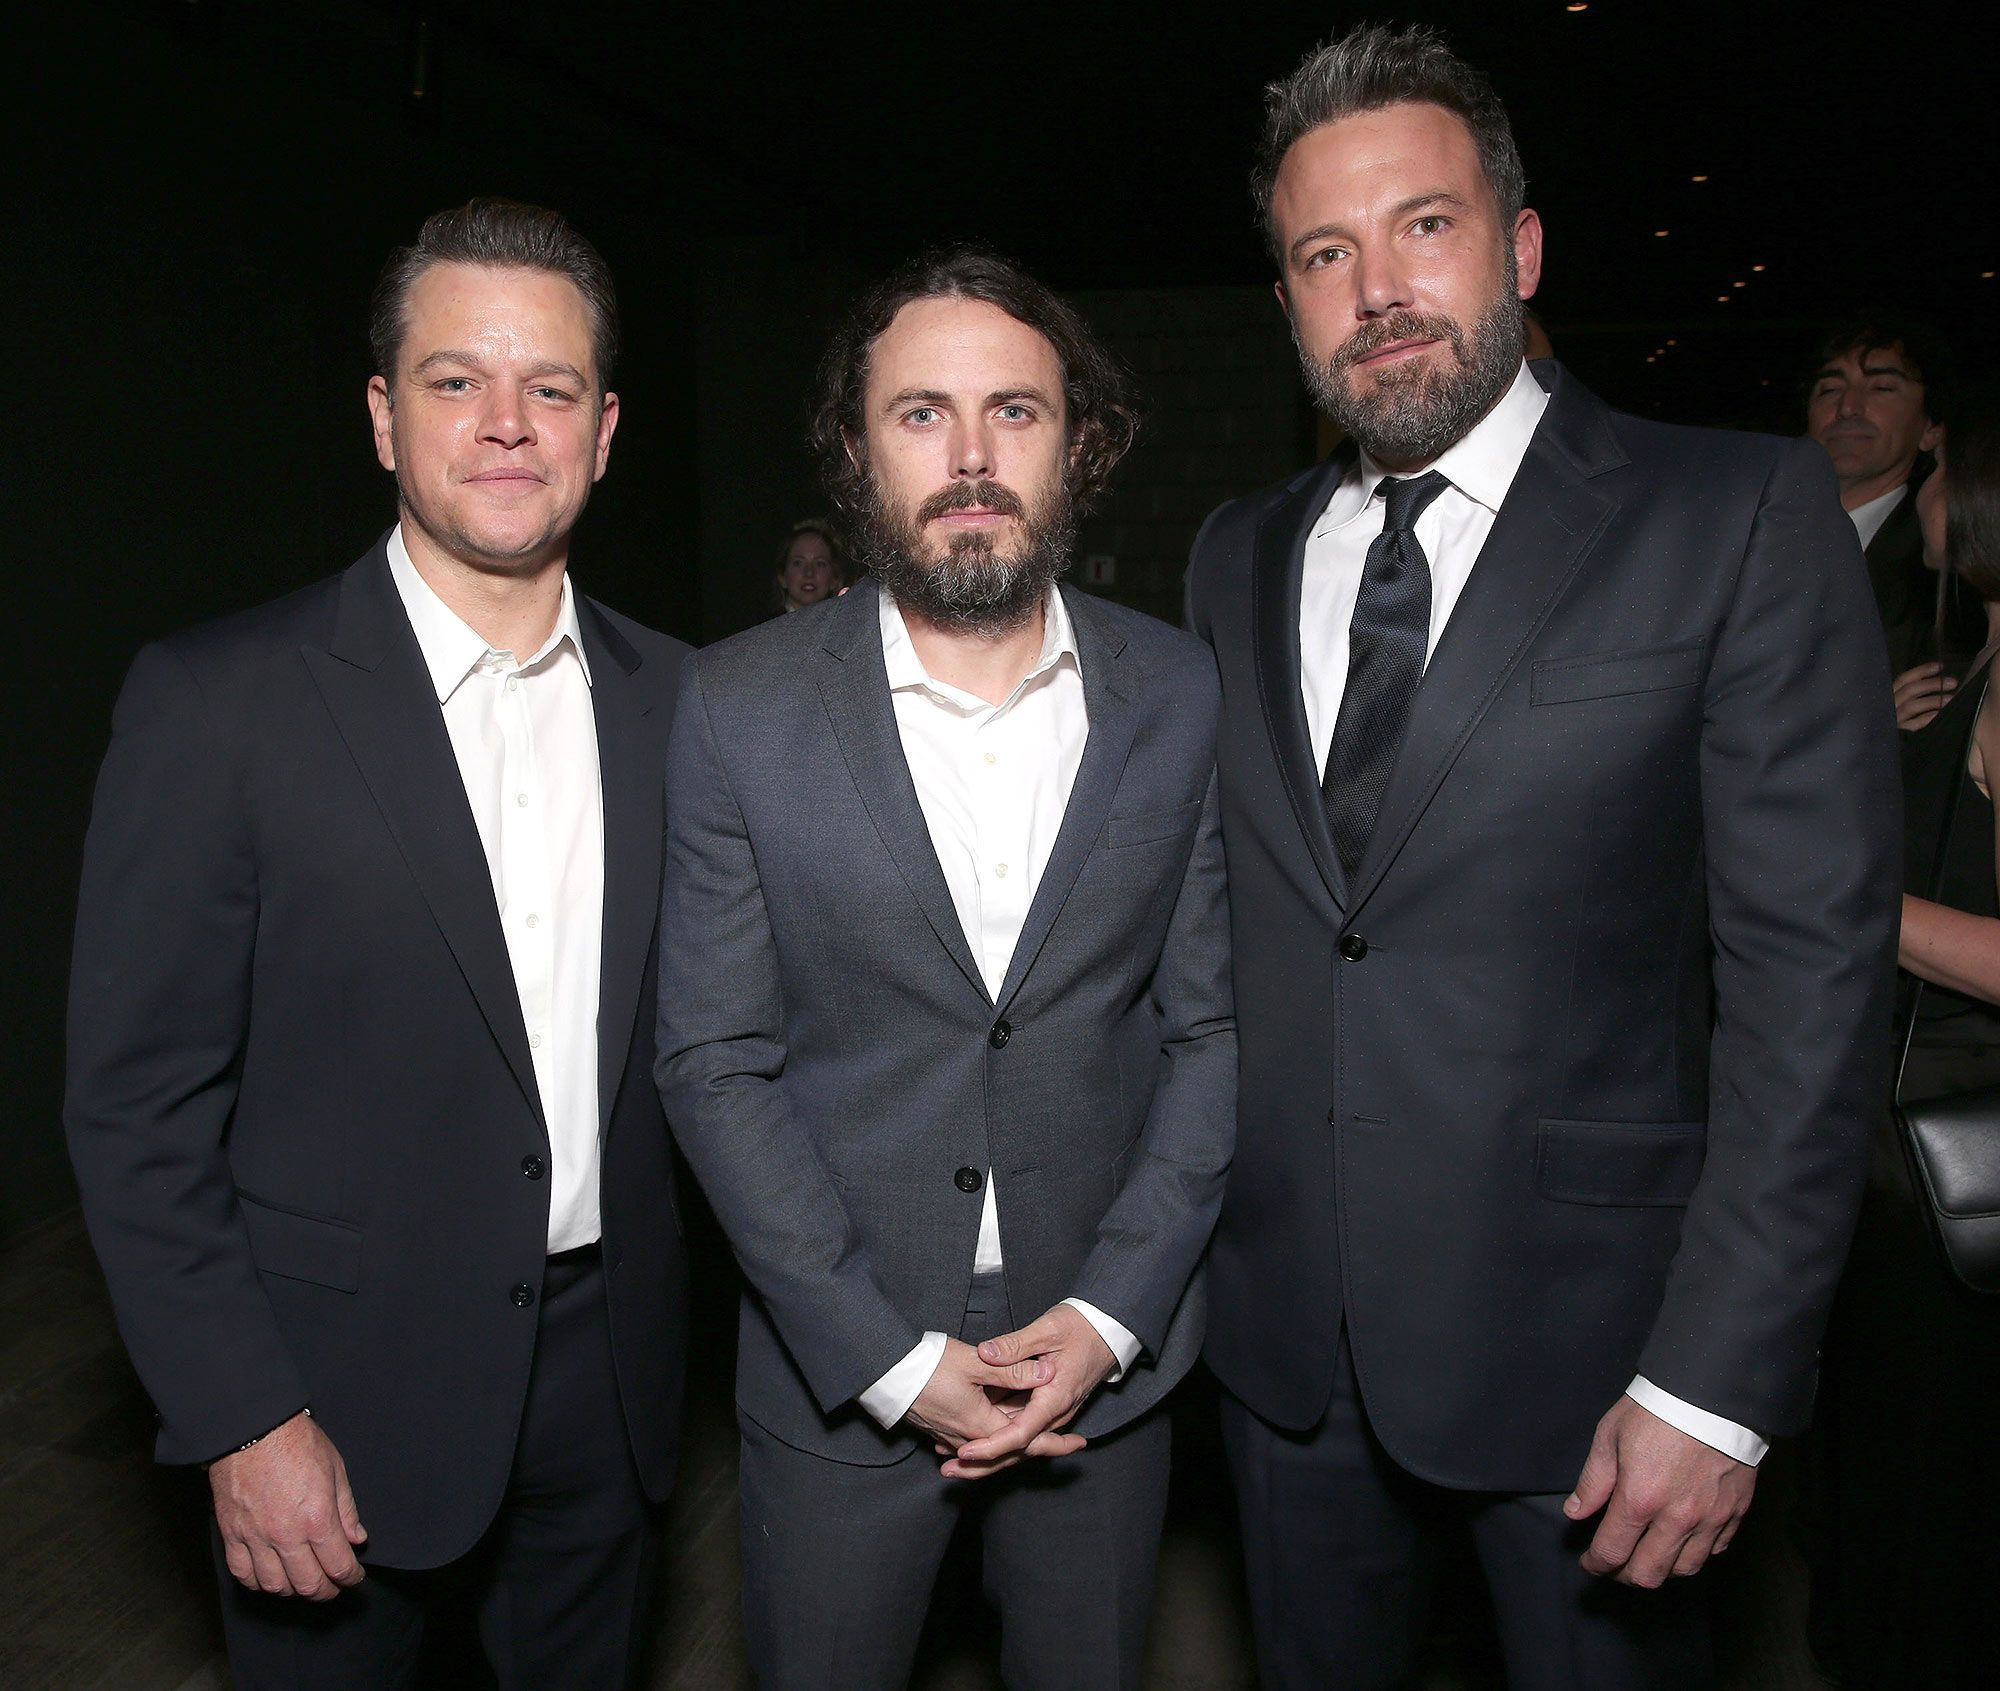 Casey And Ben Affleck And Matt Damon From Boston To Oscar Matt Damon Ben Affleck Street Film